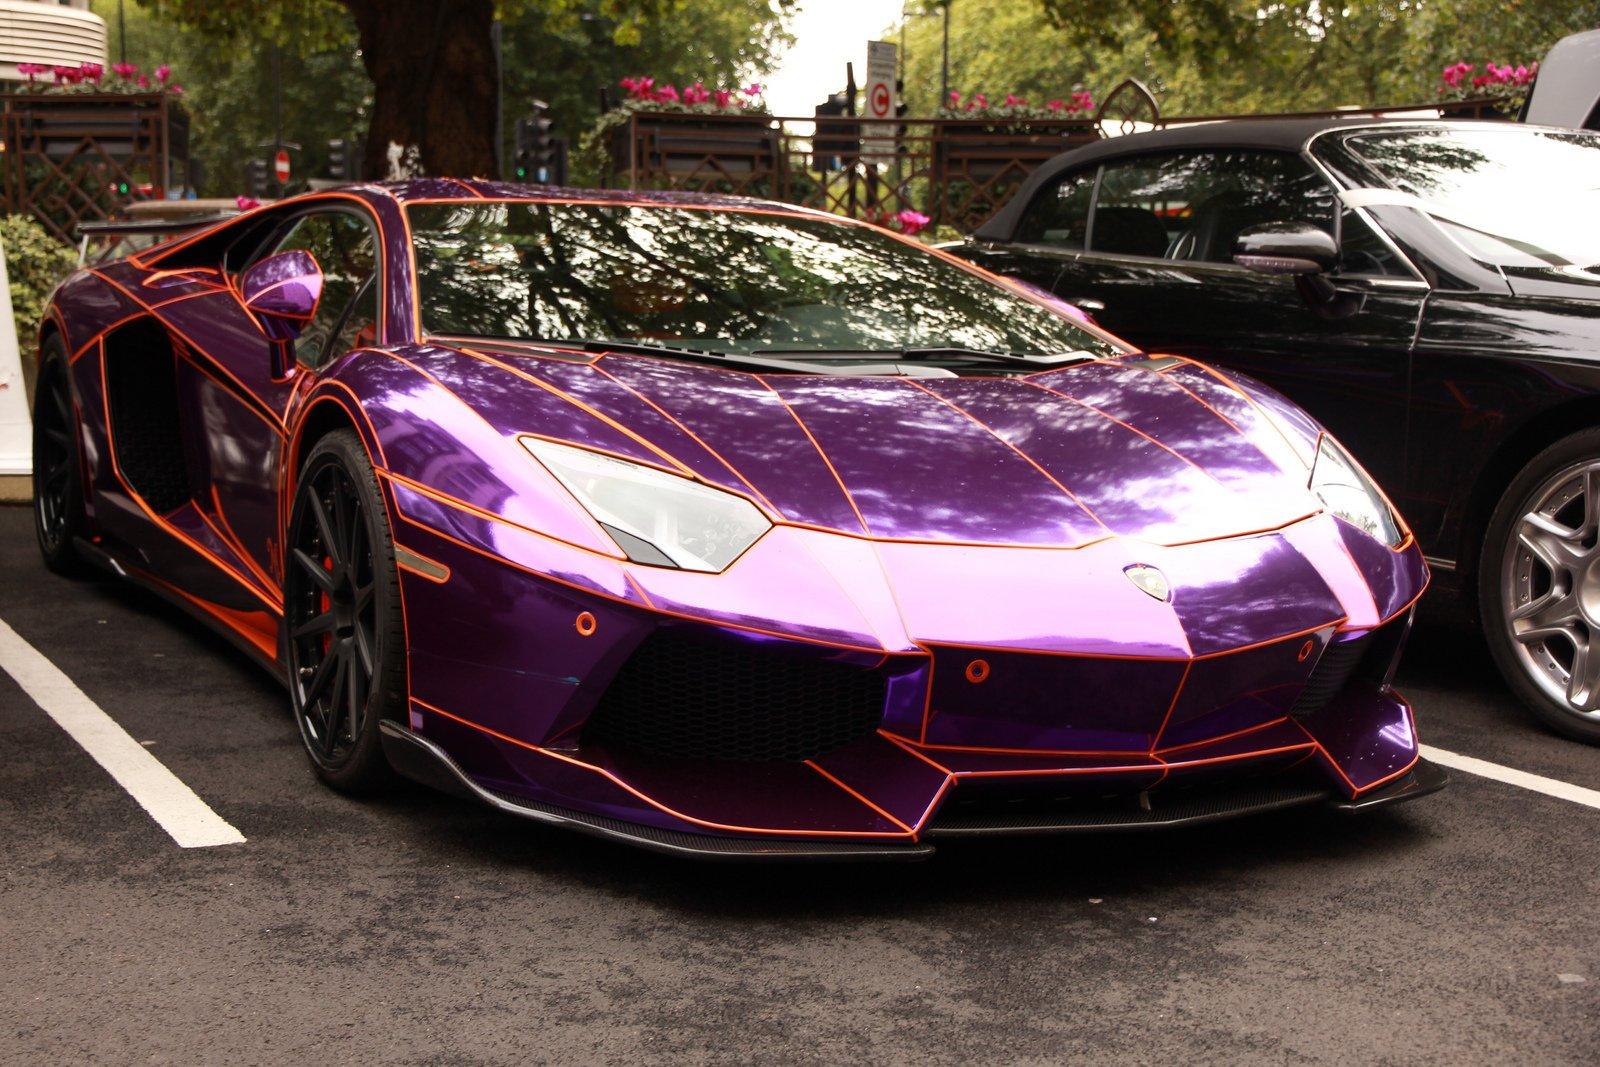 aventador purple chrome lamborghini lp700 supercars tuning wrapping wallpaper 1600x1067 393723 wallpaperup